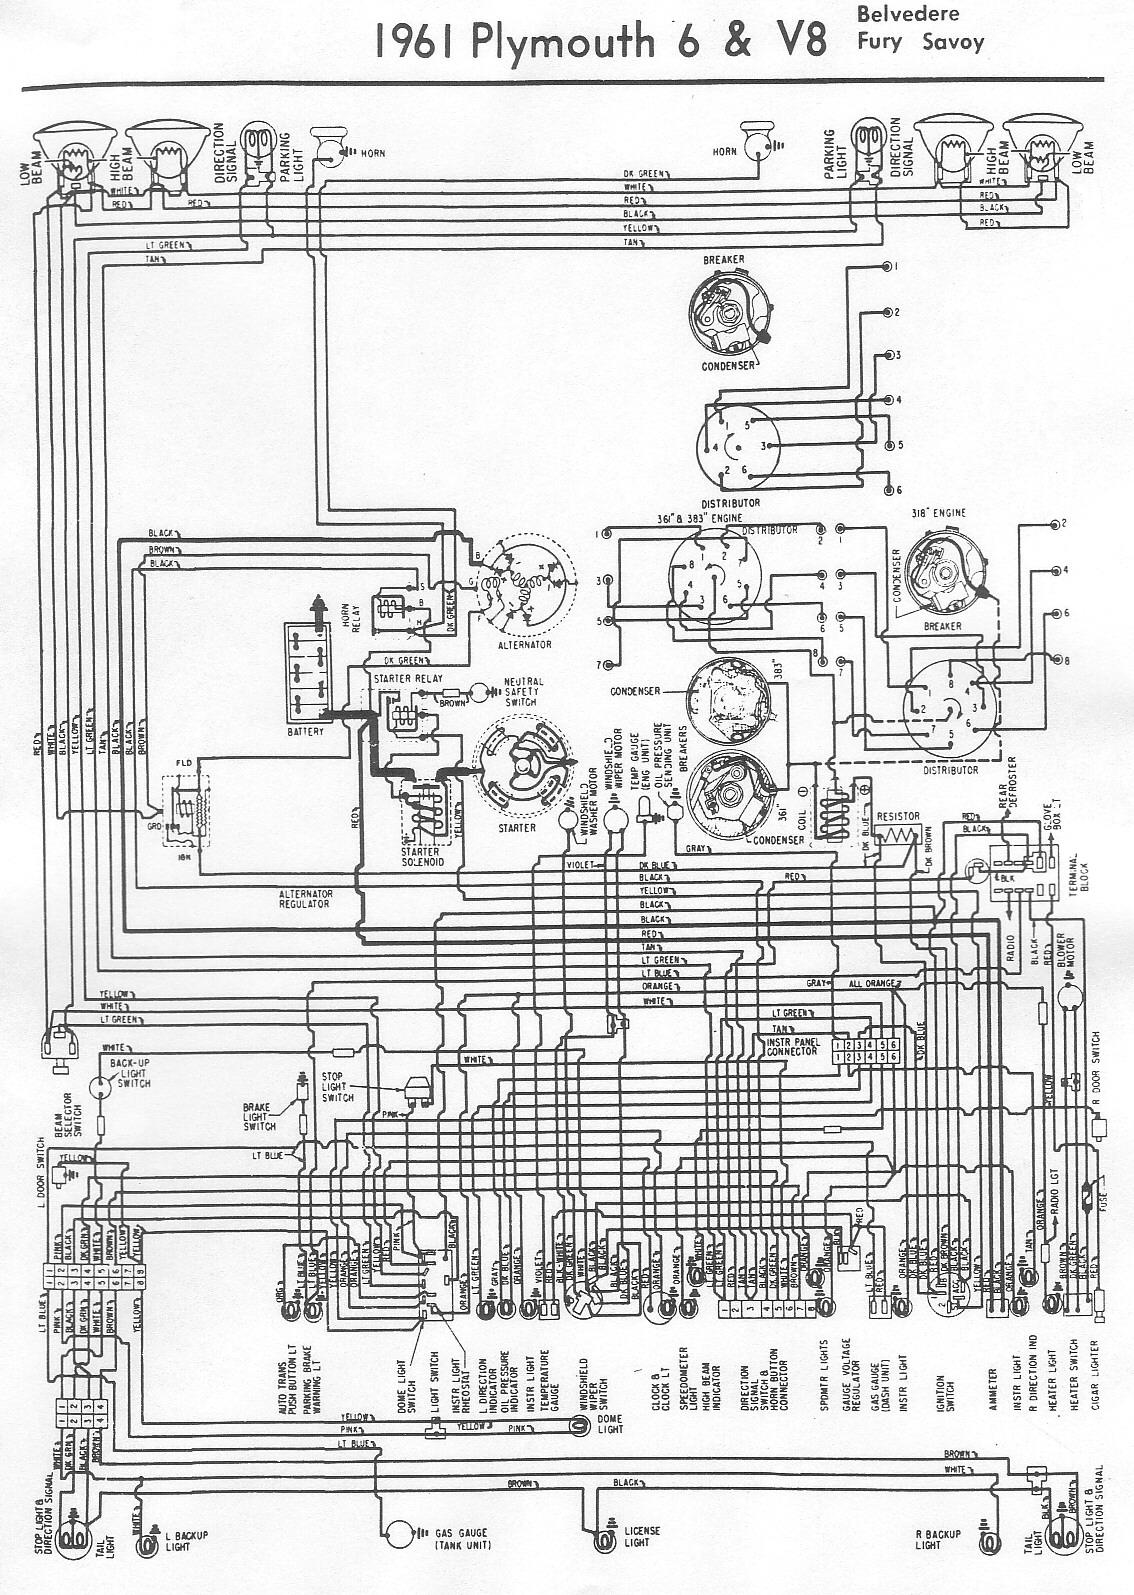 1969 mustang alternator wiring diagram vw 1600 1973 mach 1 voltage regulator